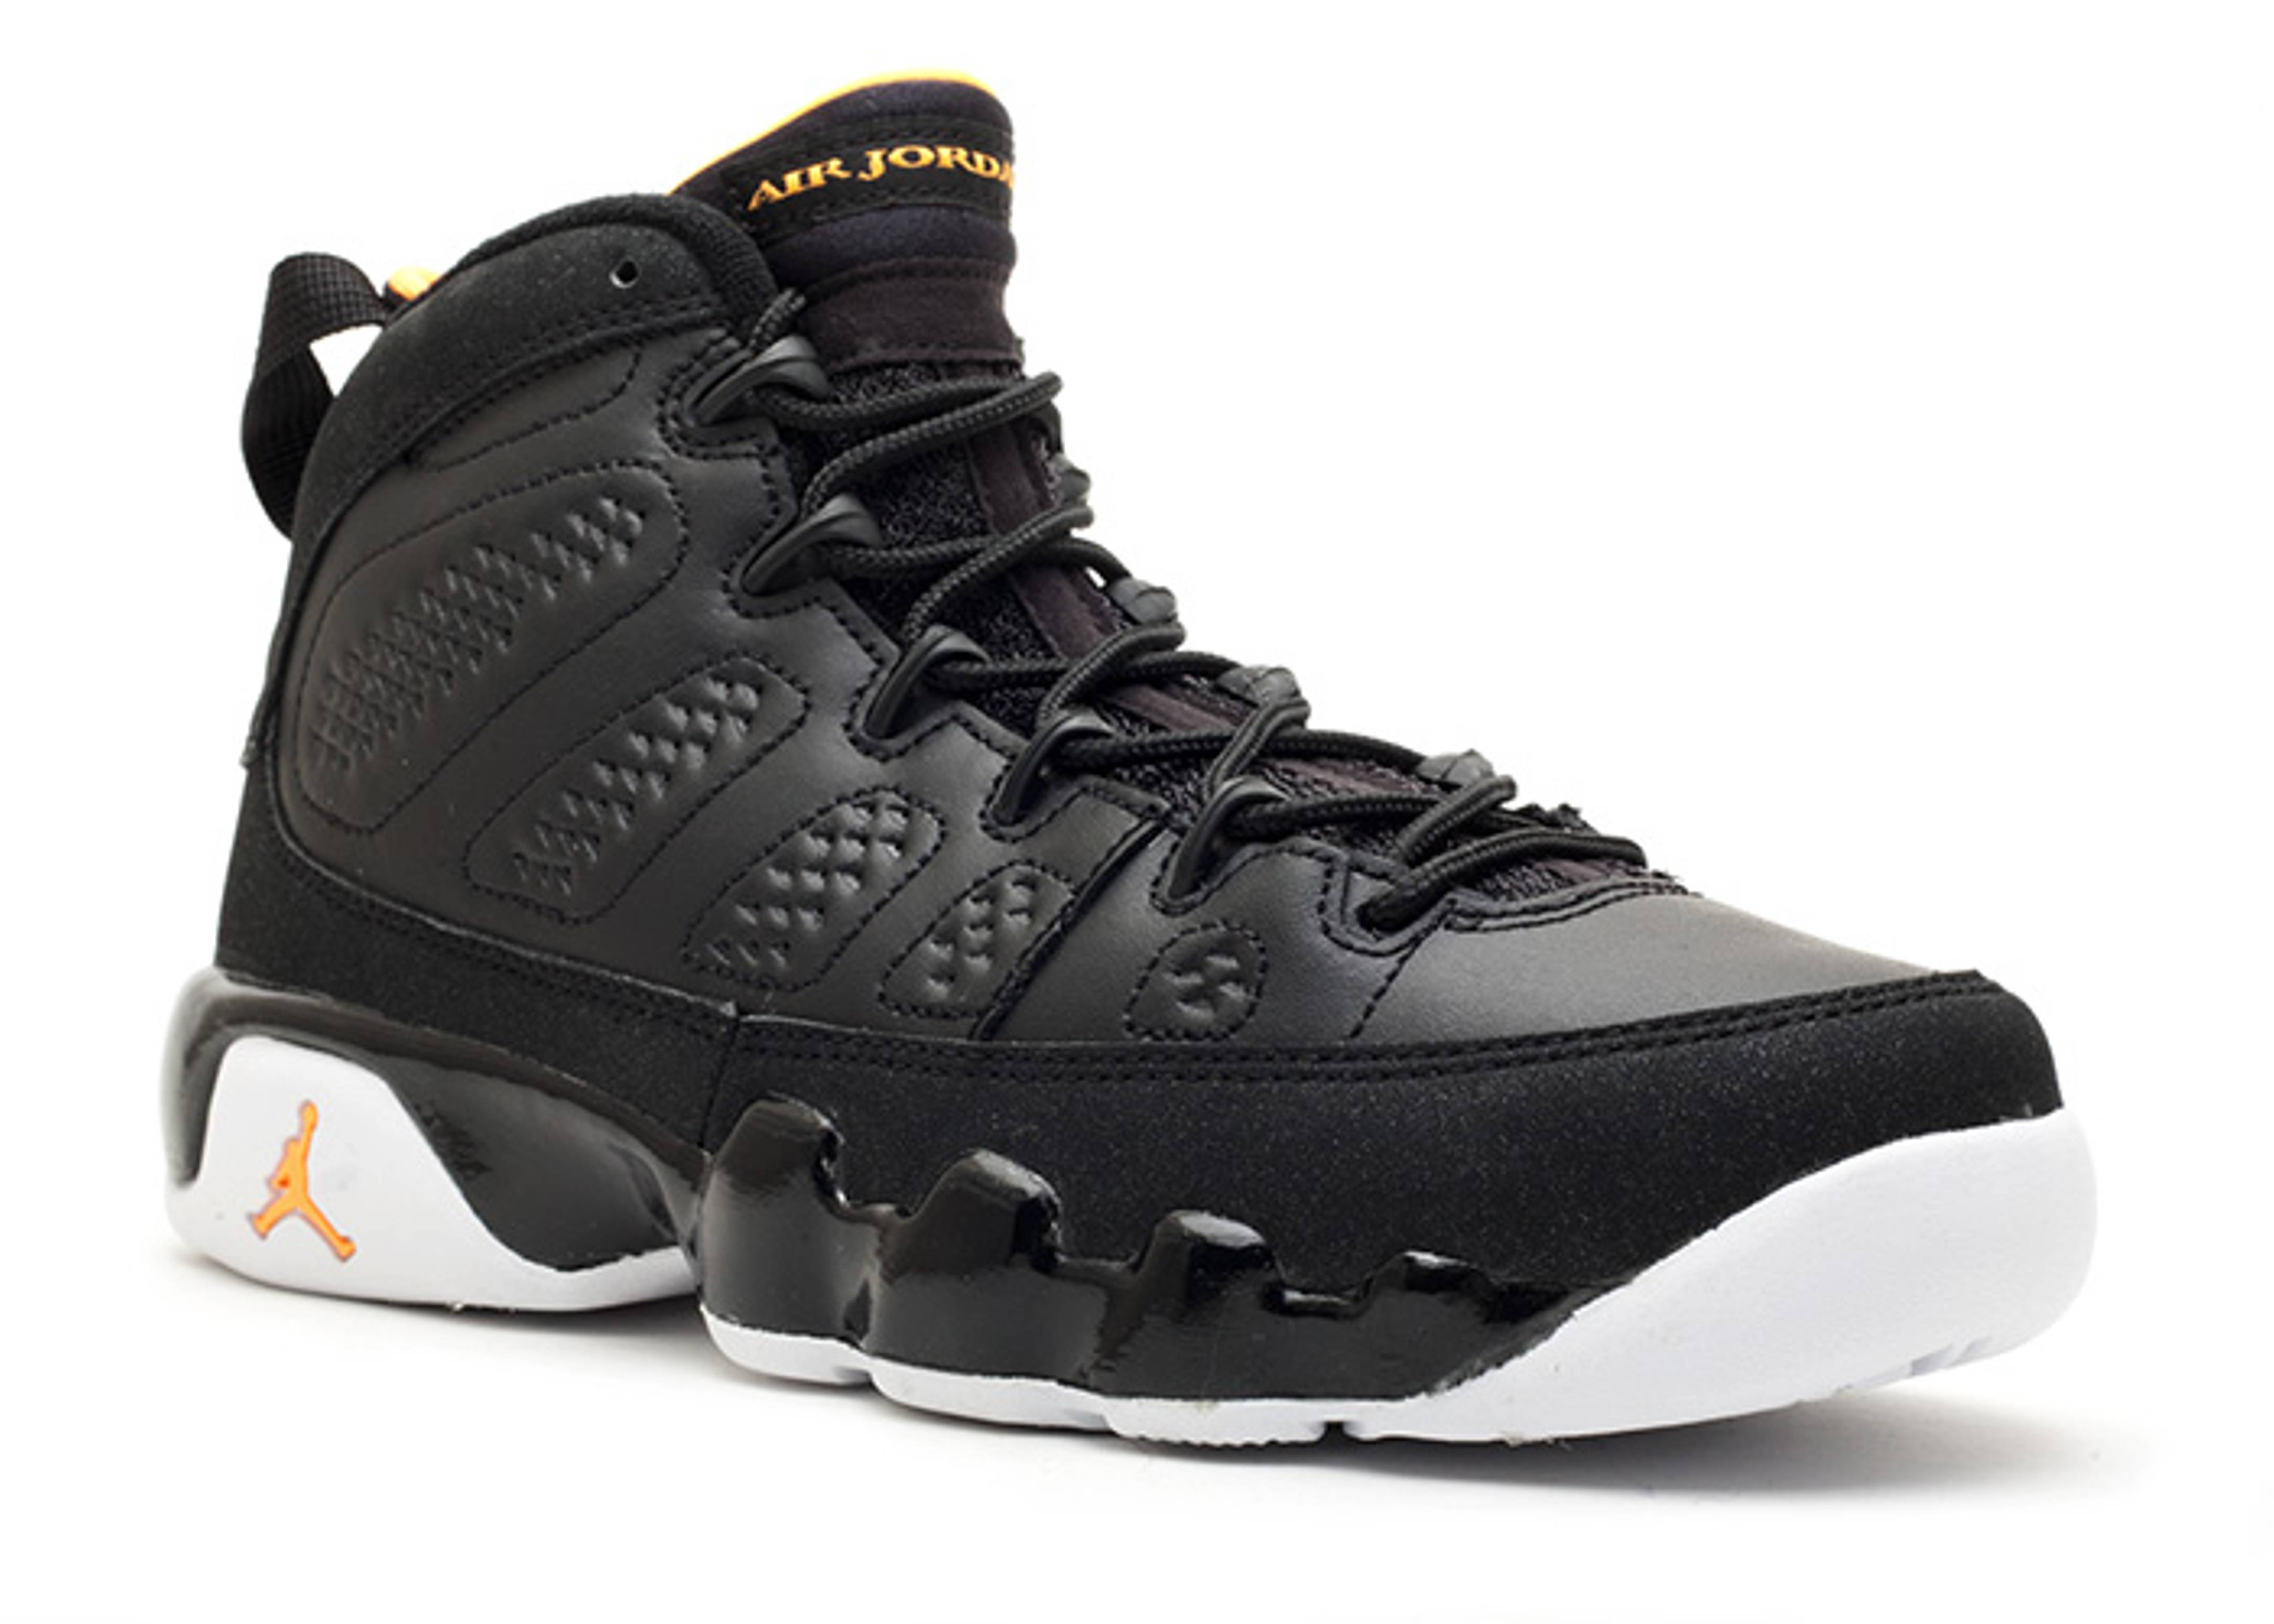 online store af252 c1e99 Air Jordan 9 Retro (gs) - Air Jordan - 302359 004 - black citrus-white    Flight Club